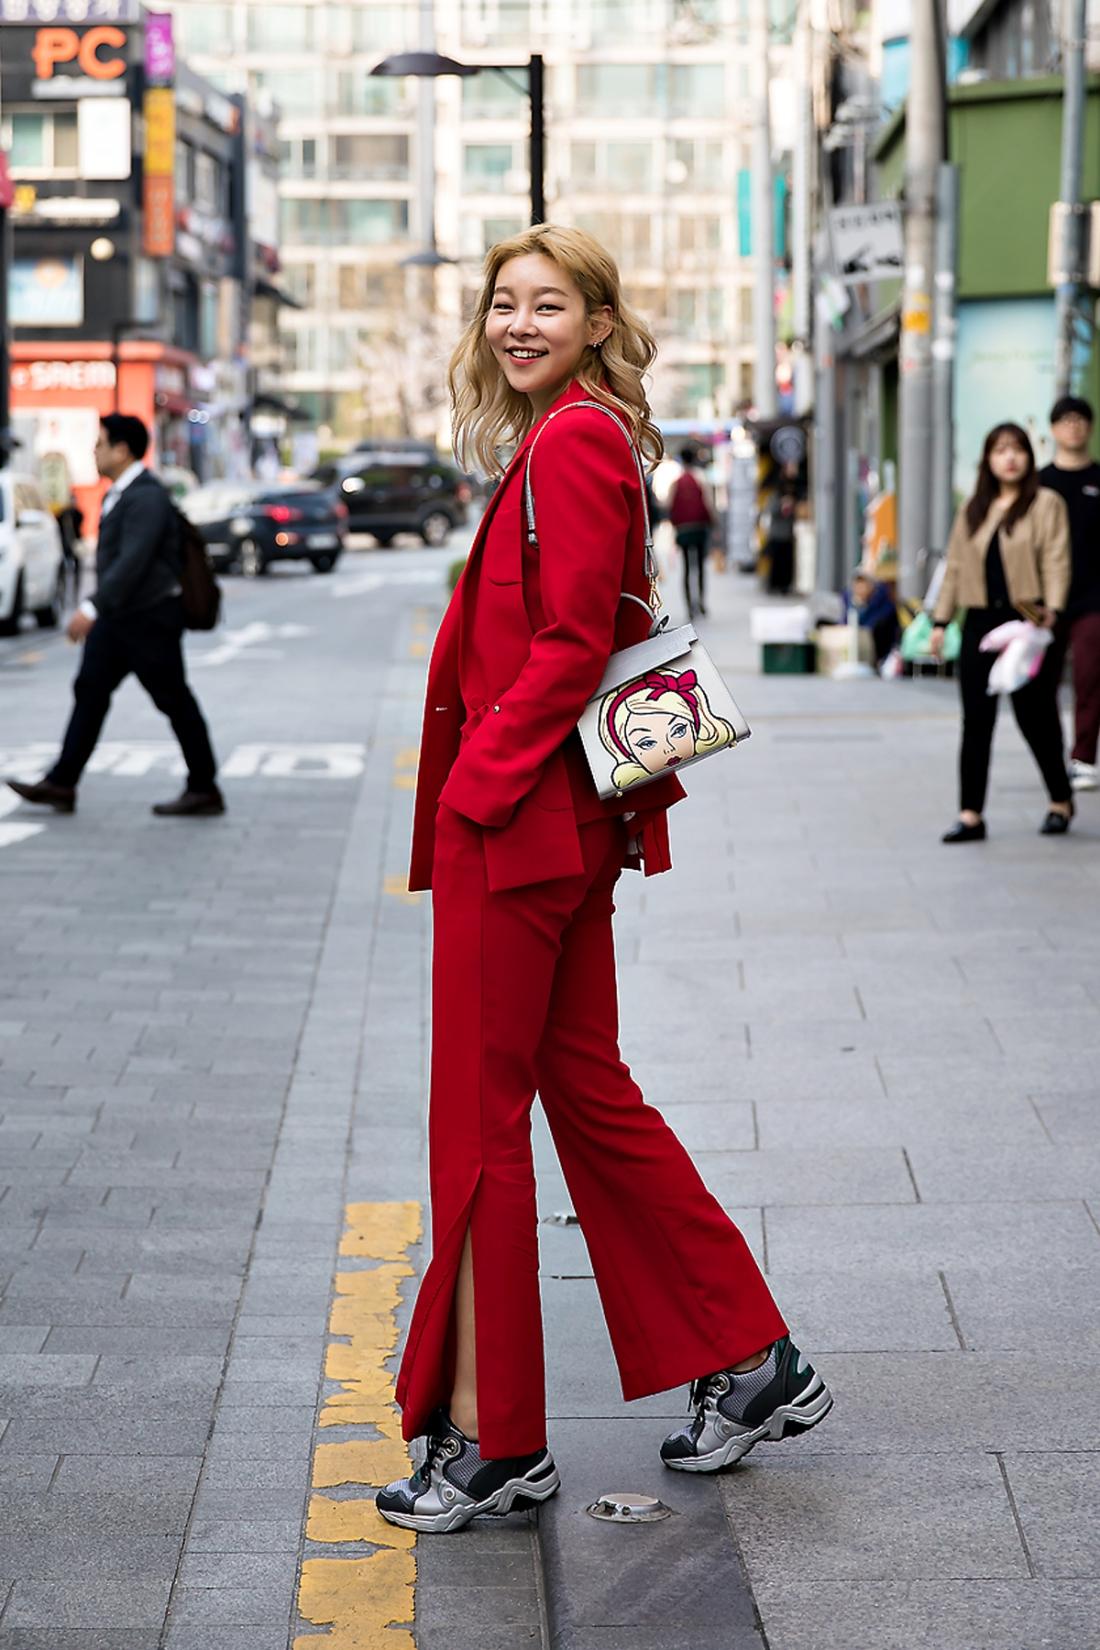 Song Haena, Street Fashion 2017 in Seoul.jpg